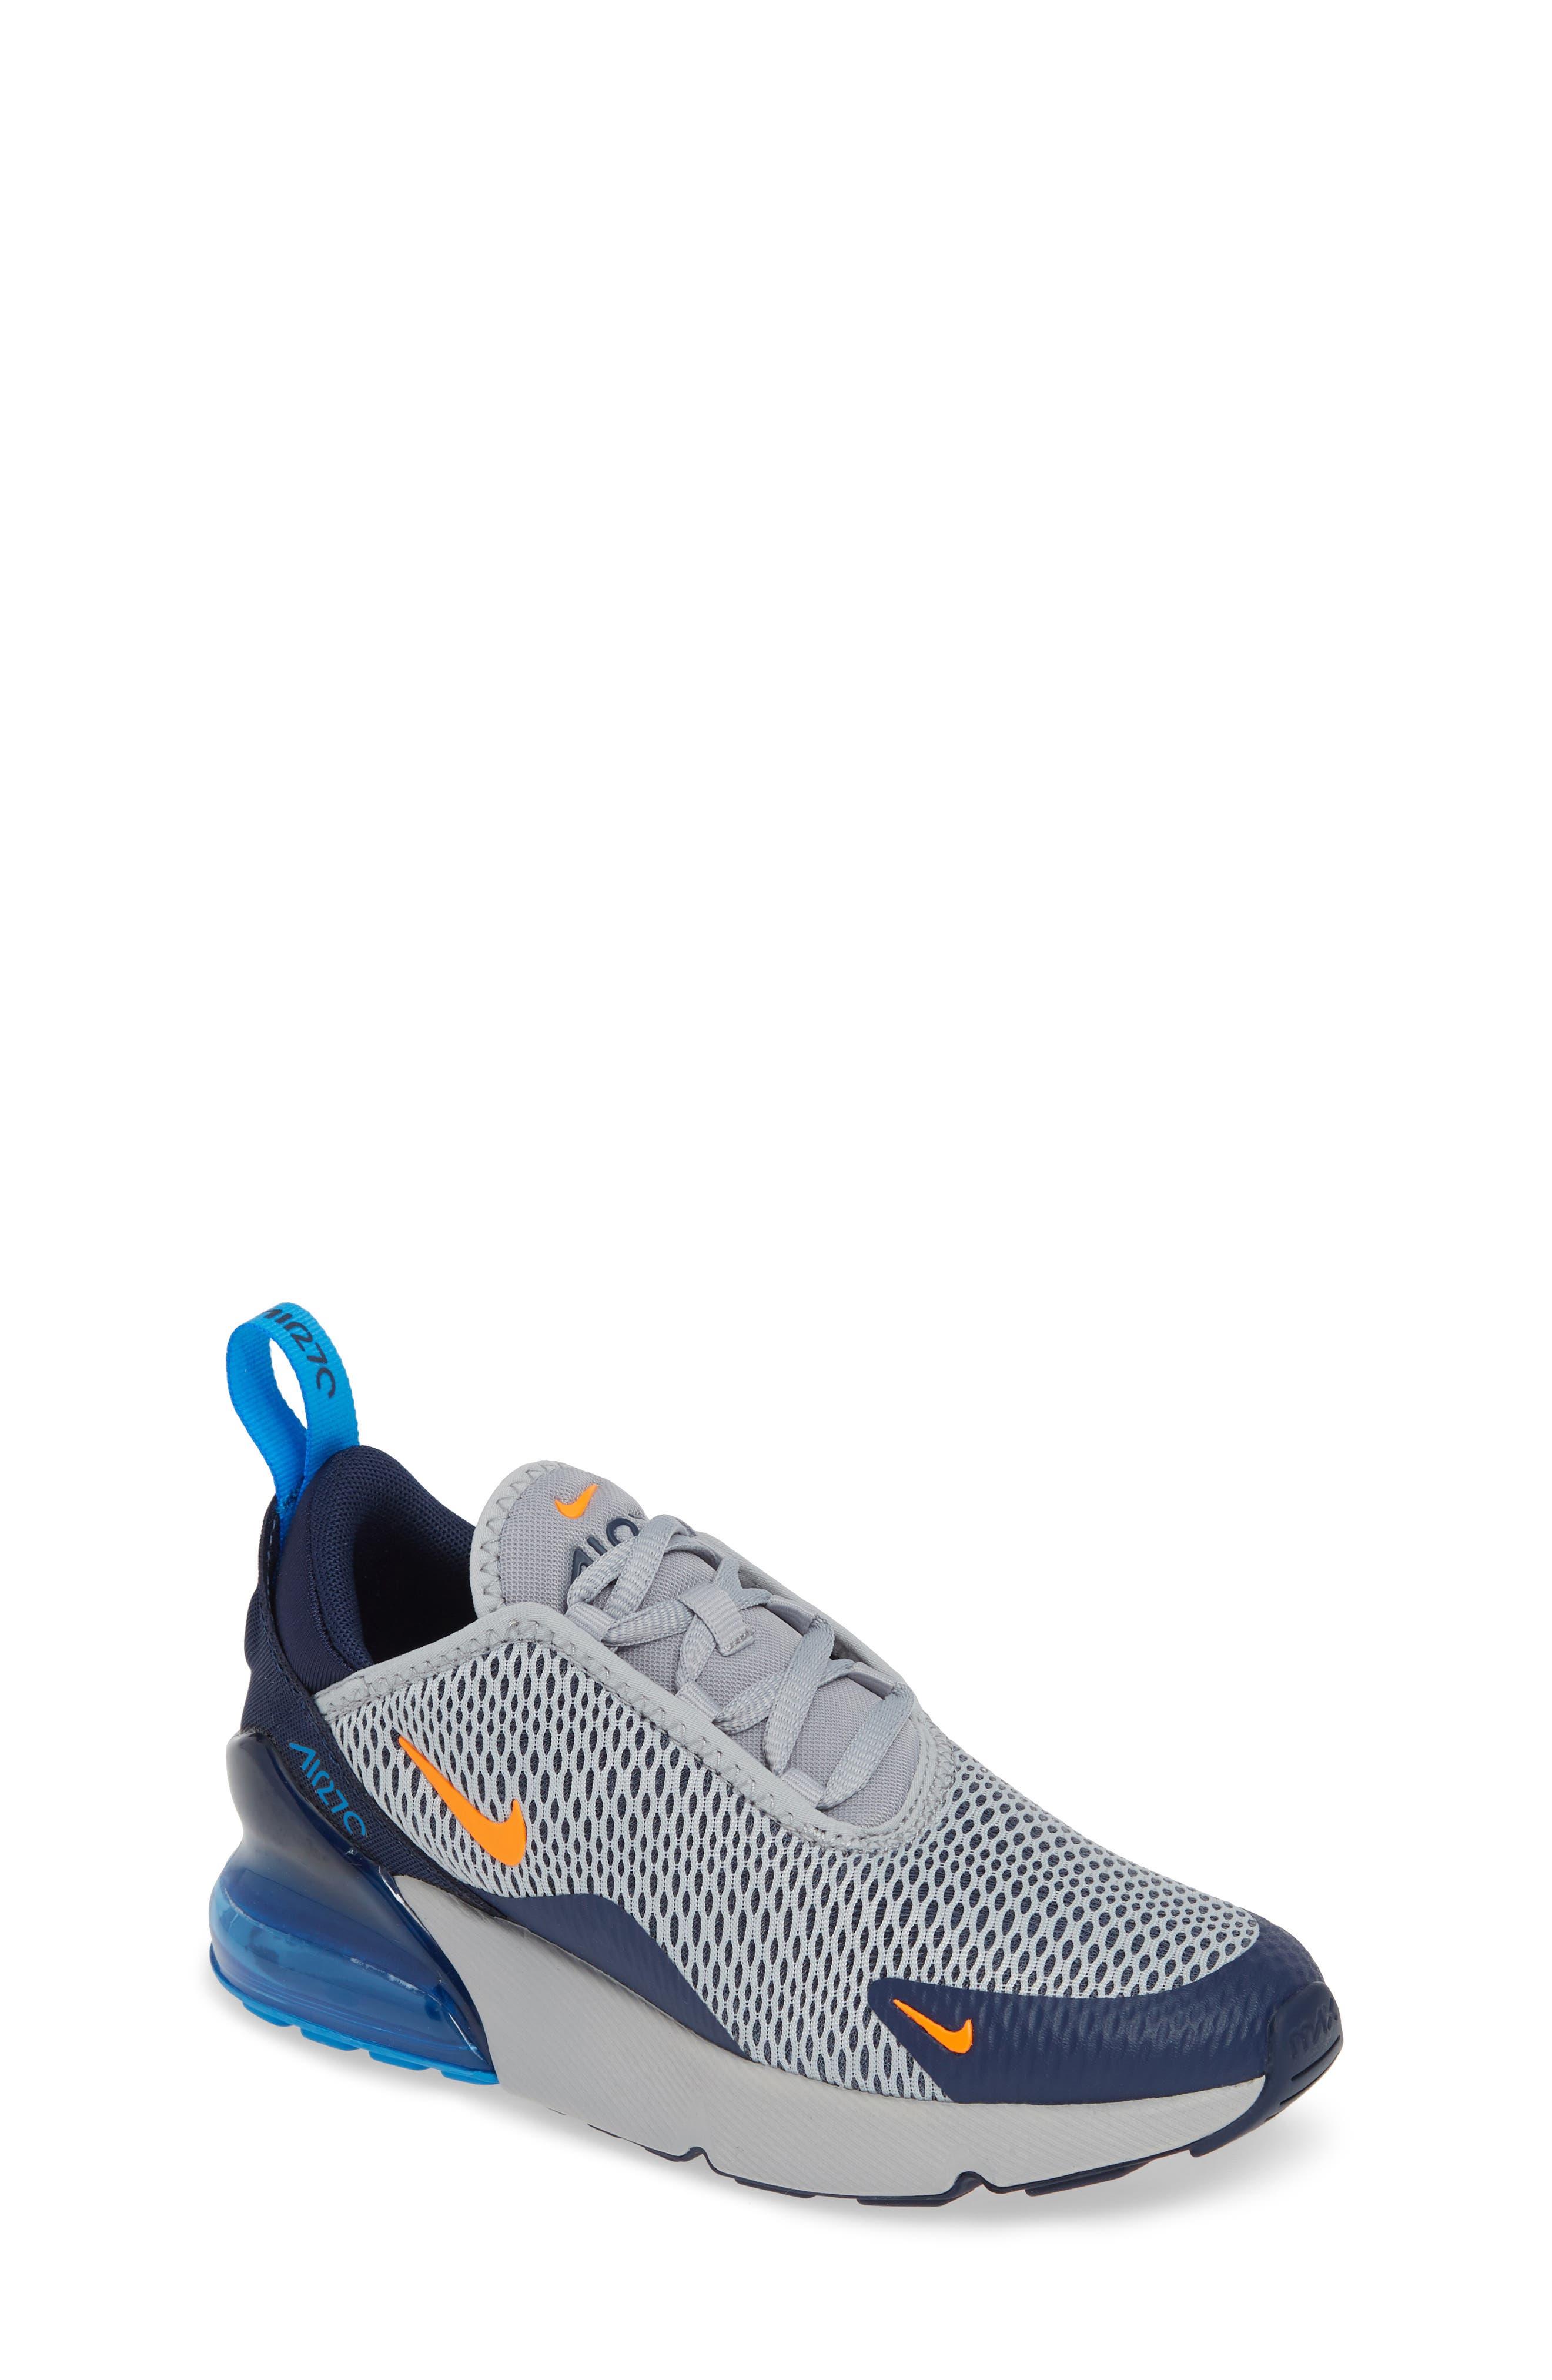 ShoesNordstrom Nike Boys' Boys' Boys' ShoesNordstrom Nike ShoesNordstrom Nike pzMSUV